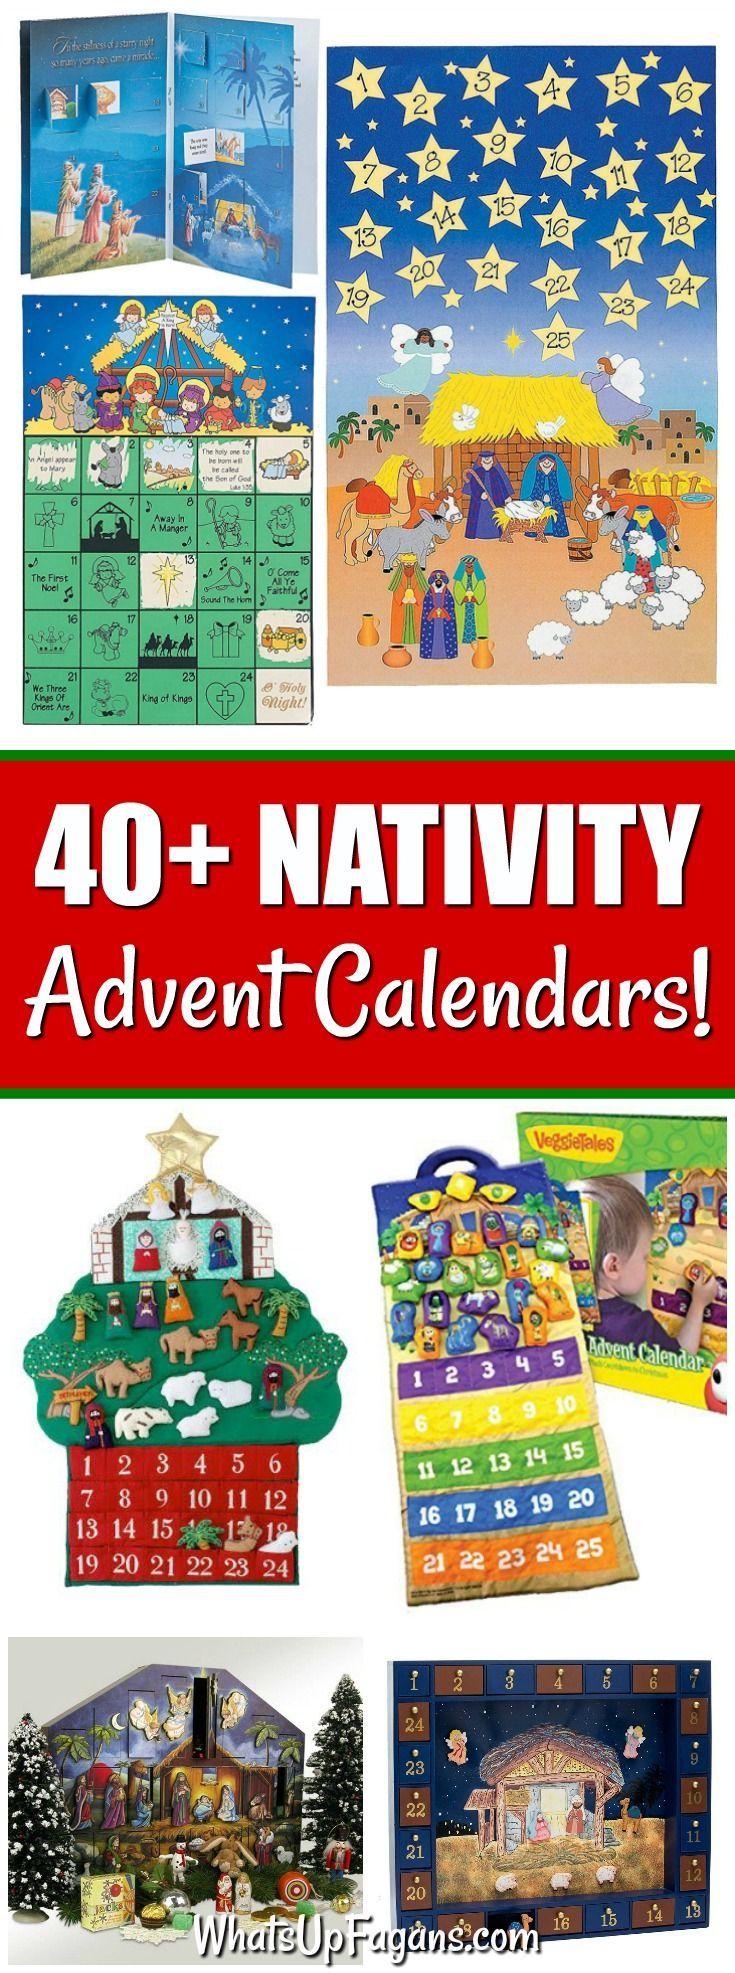 40 Christian Nativity Advent Calendars Focused On Jesus 1